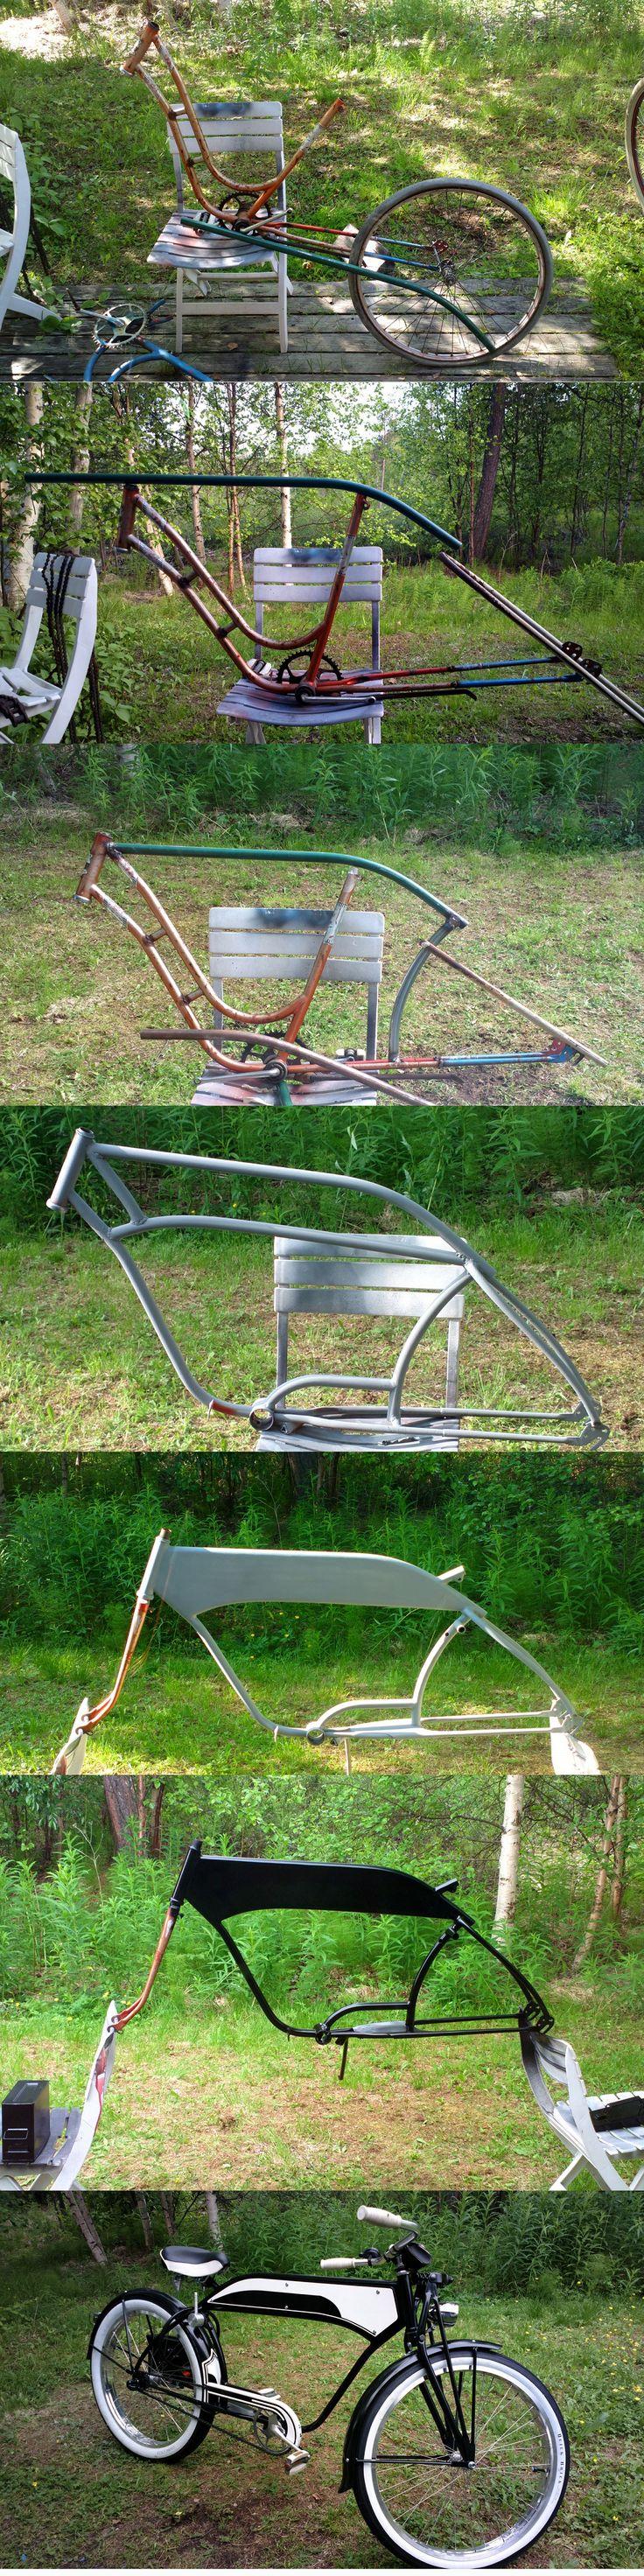 My Bicyle MK.3